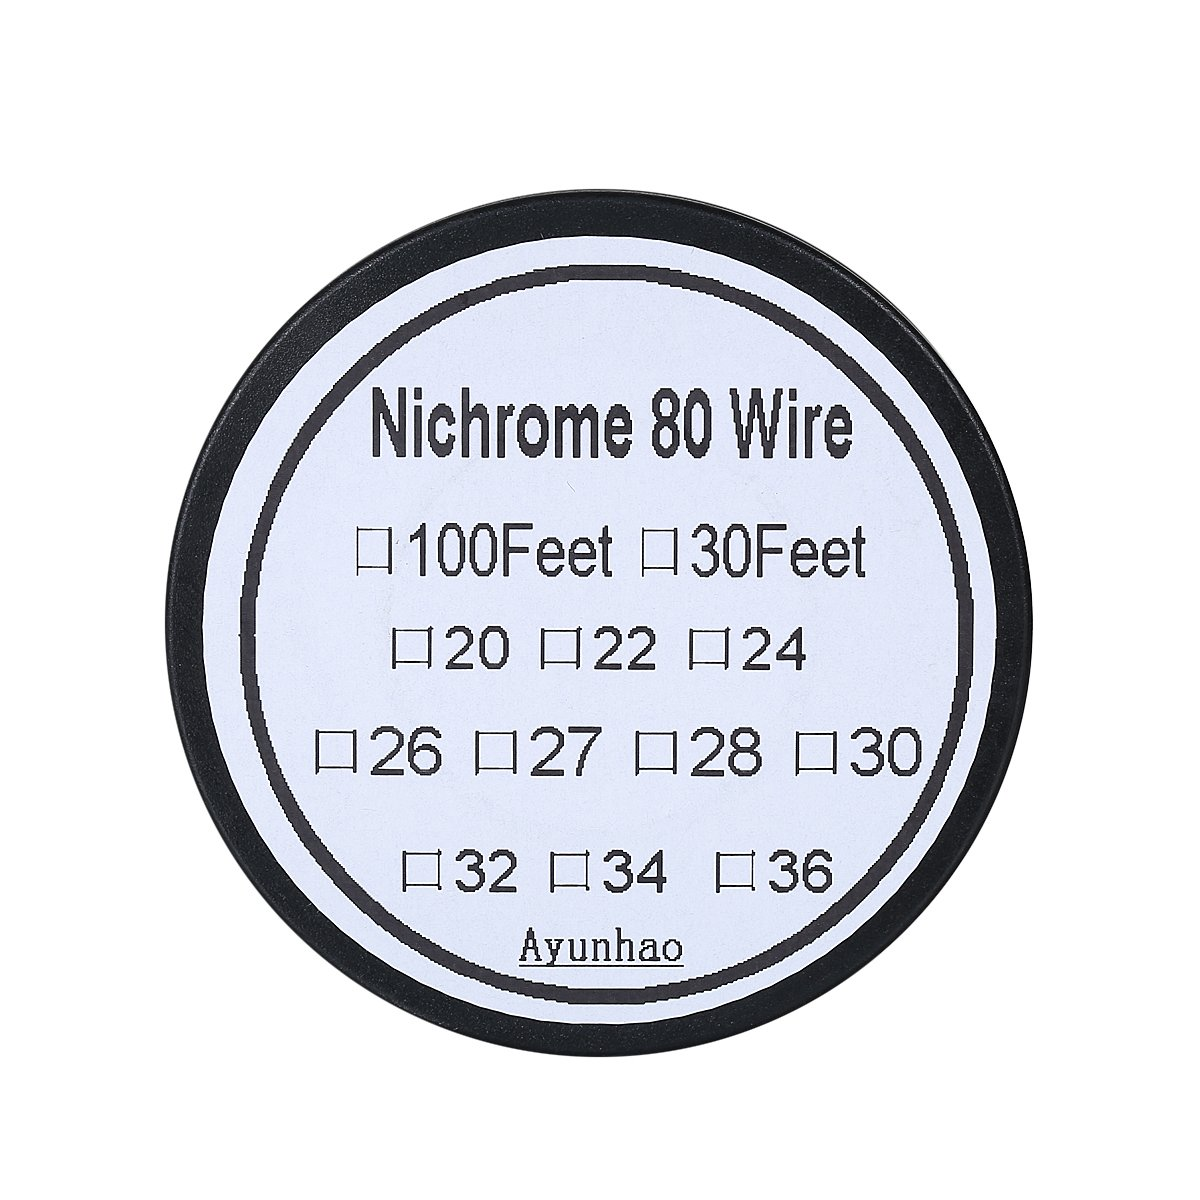 Nichrome 80 - 100 ft 34 Gauge AWG Widerstand Draht: Amazon.de ...